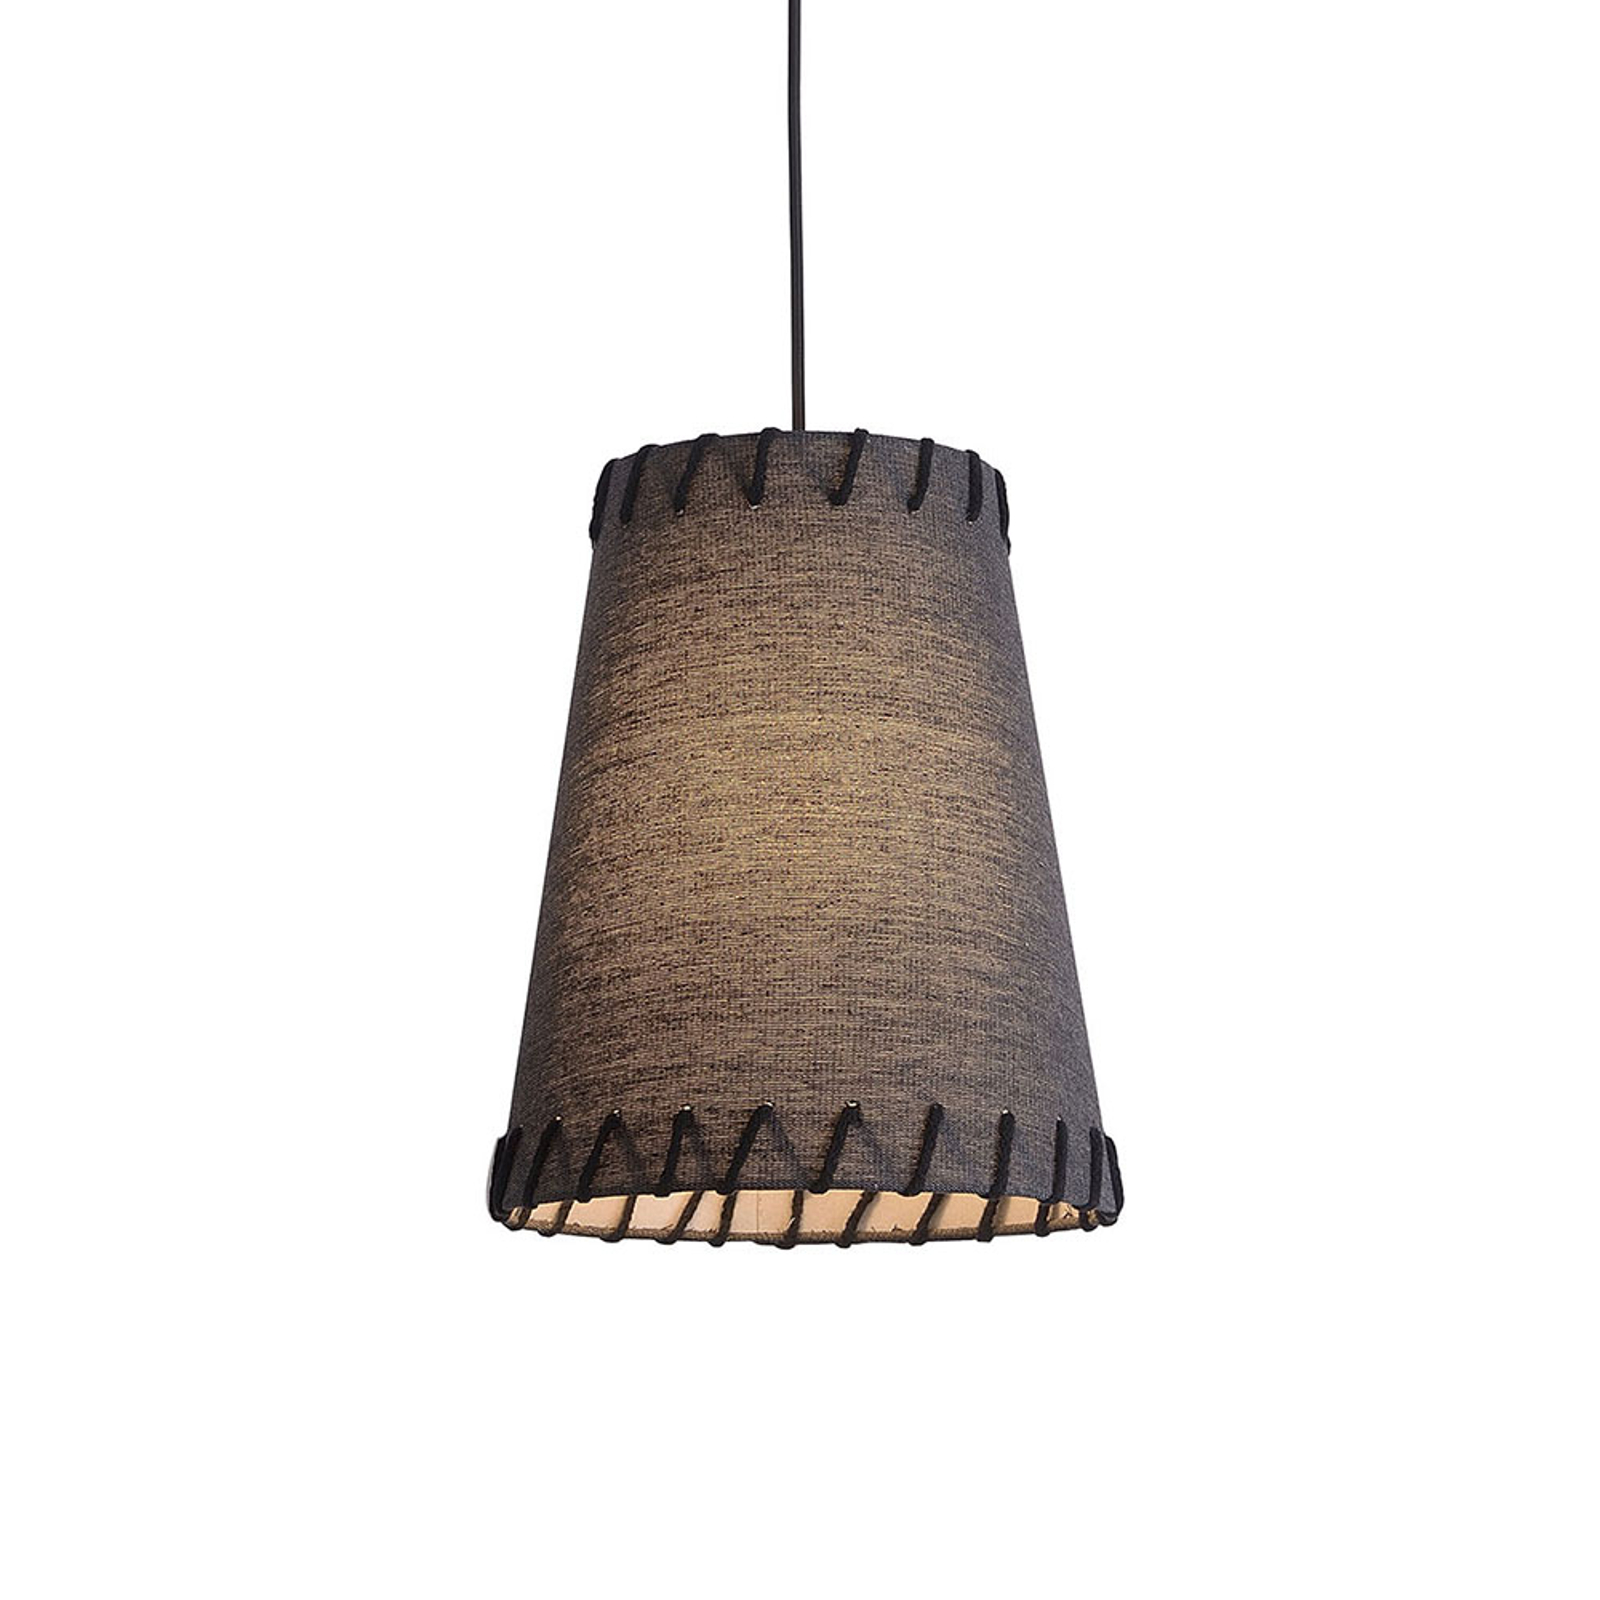 Lampa wisząca Timor, tkanina, czarna